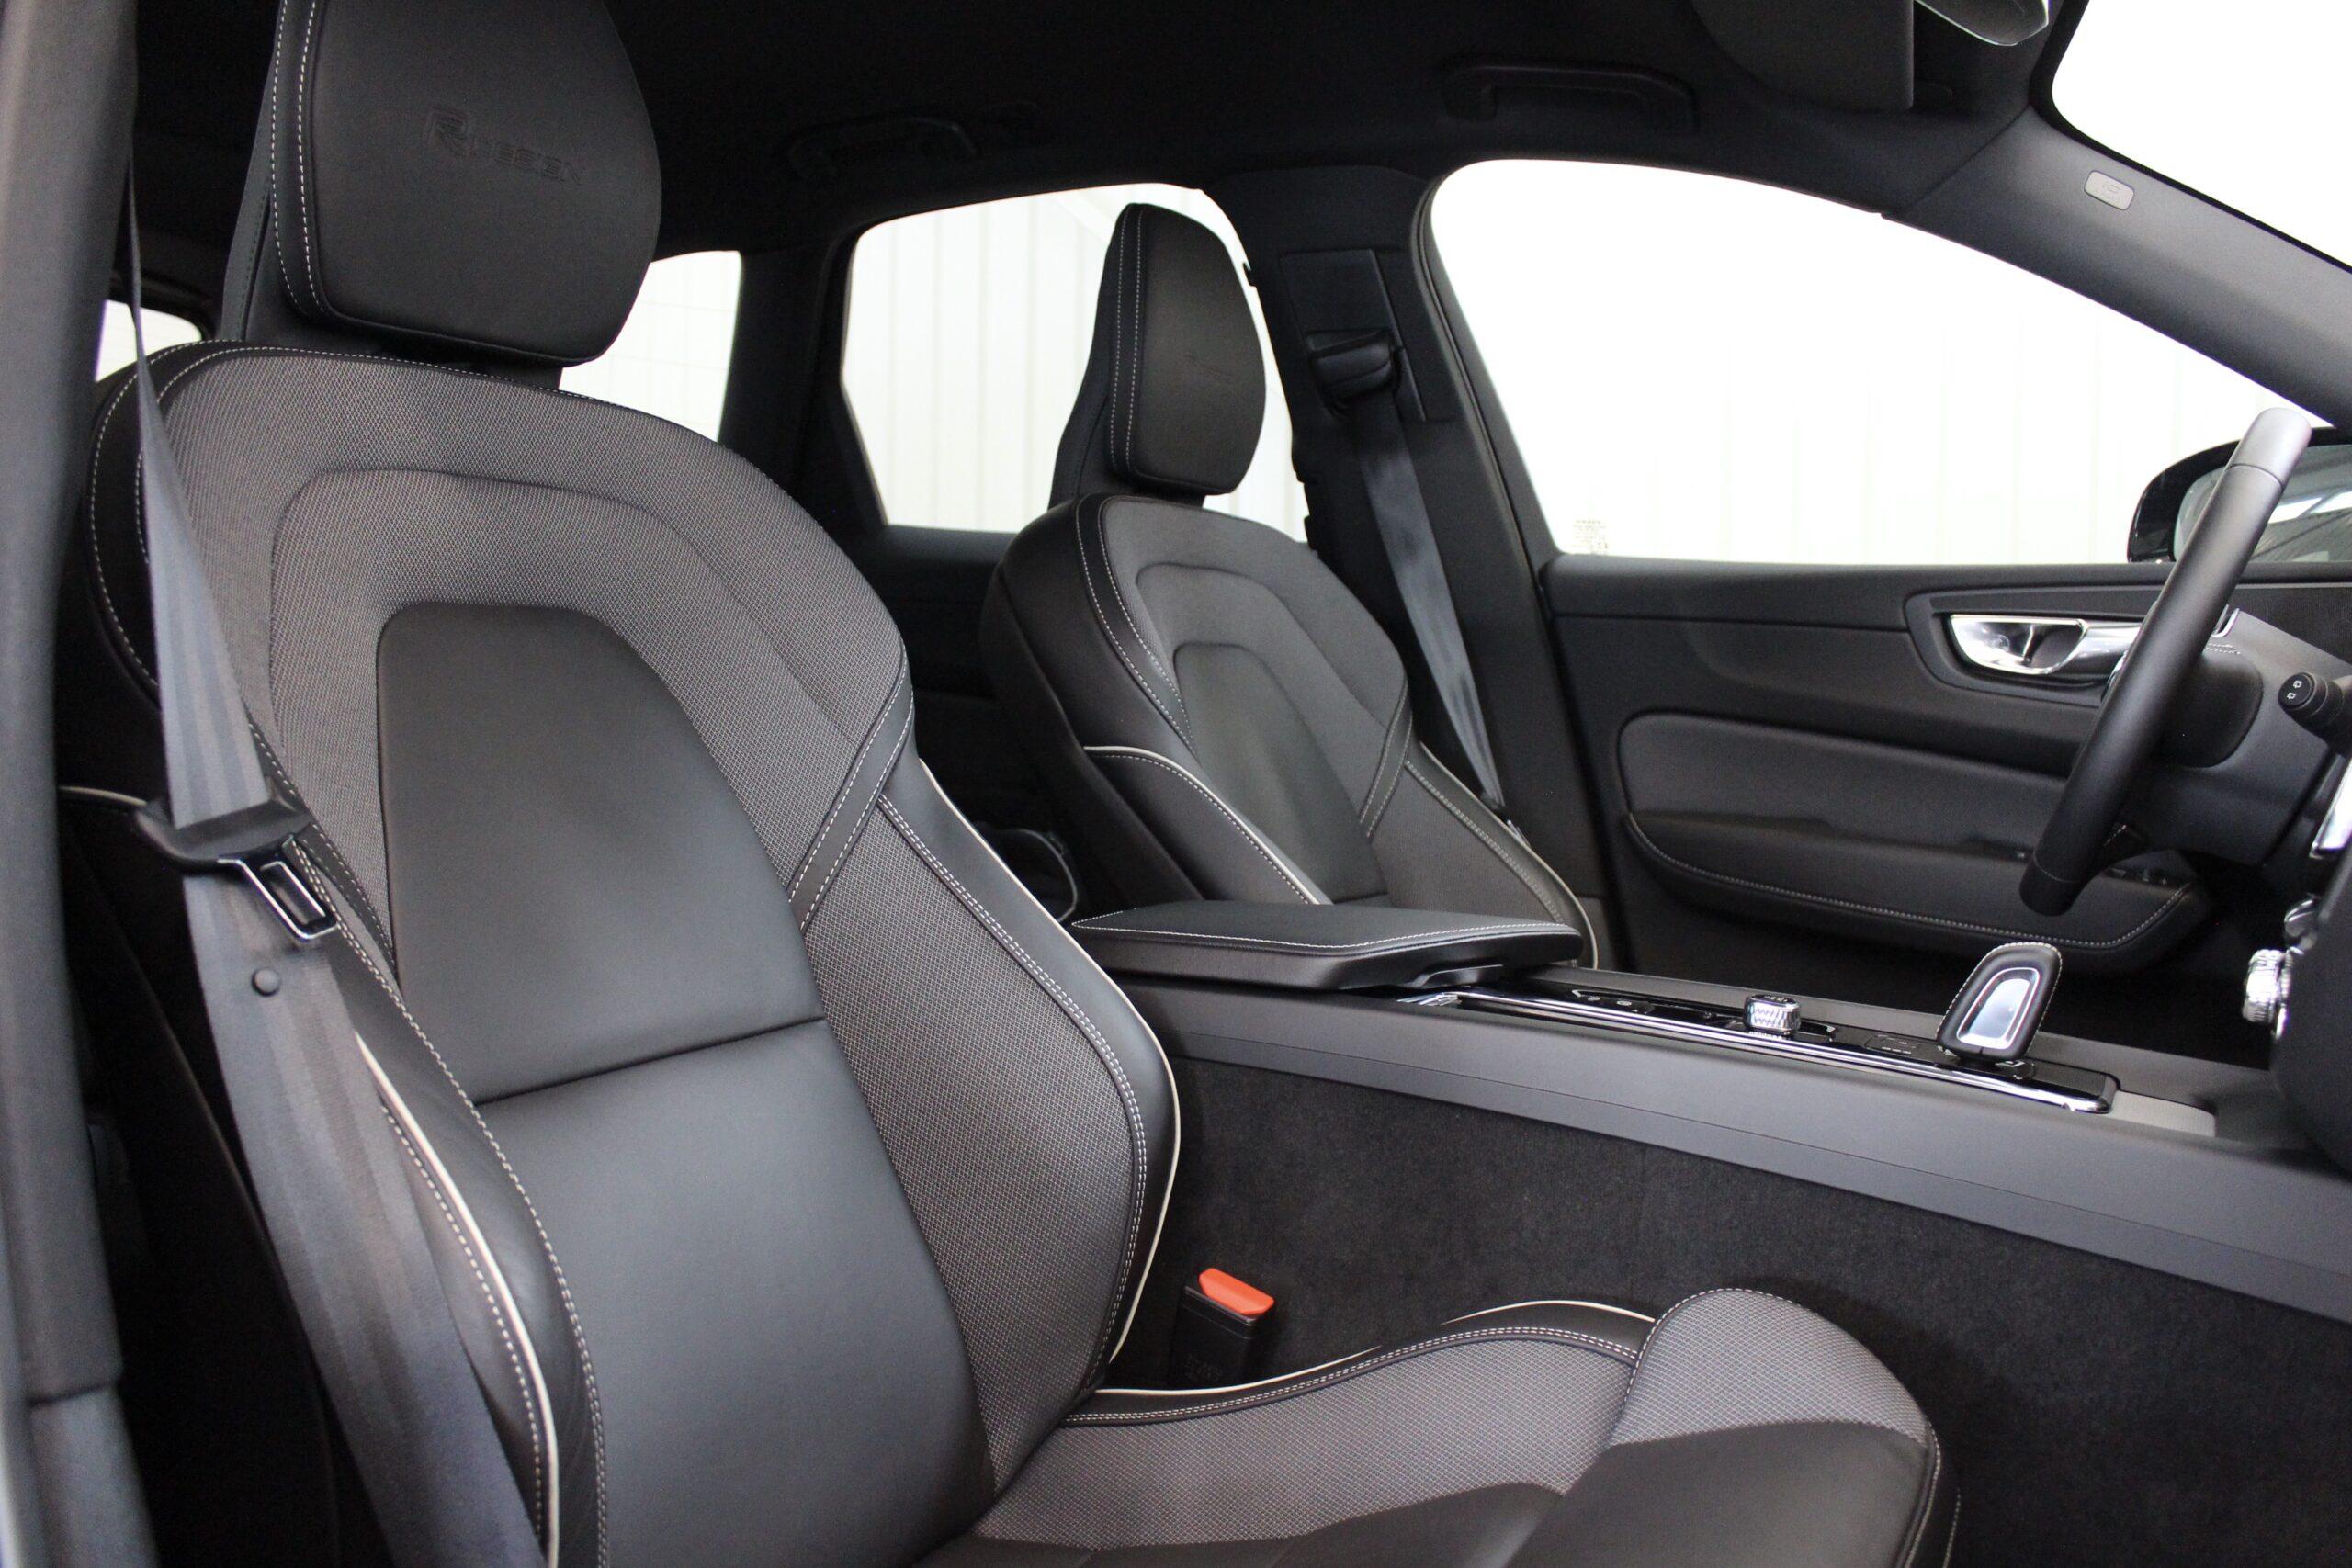 Volvo XC60 B4 AWD Geartronic R-Design Euro 6 197hk